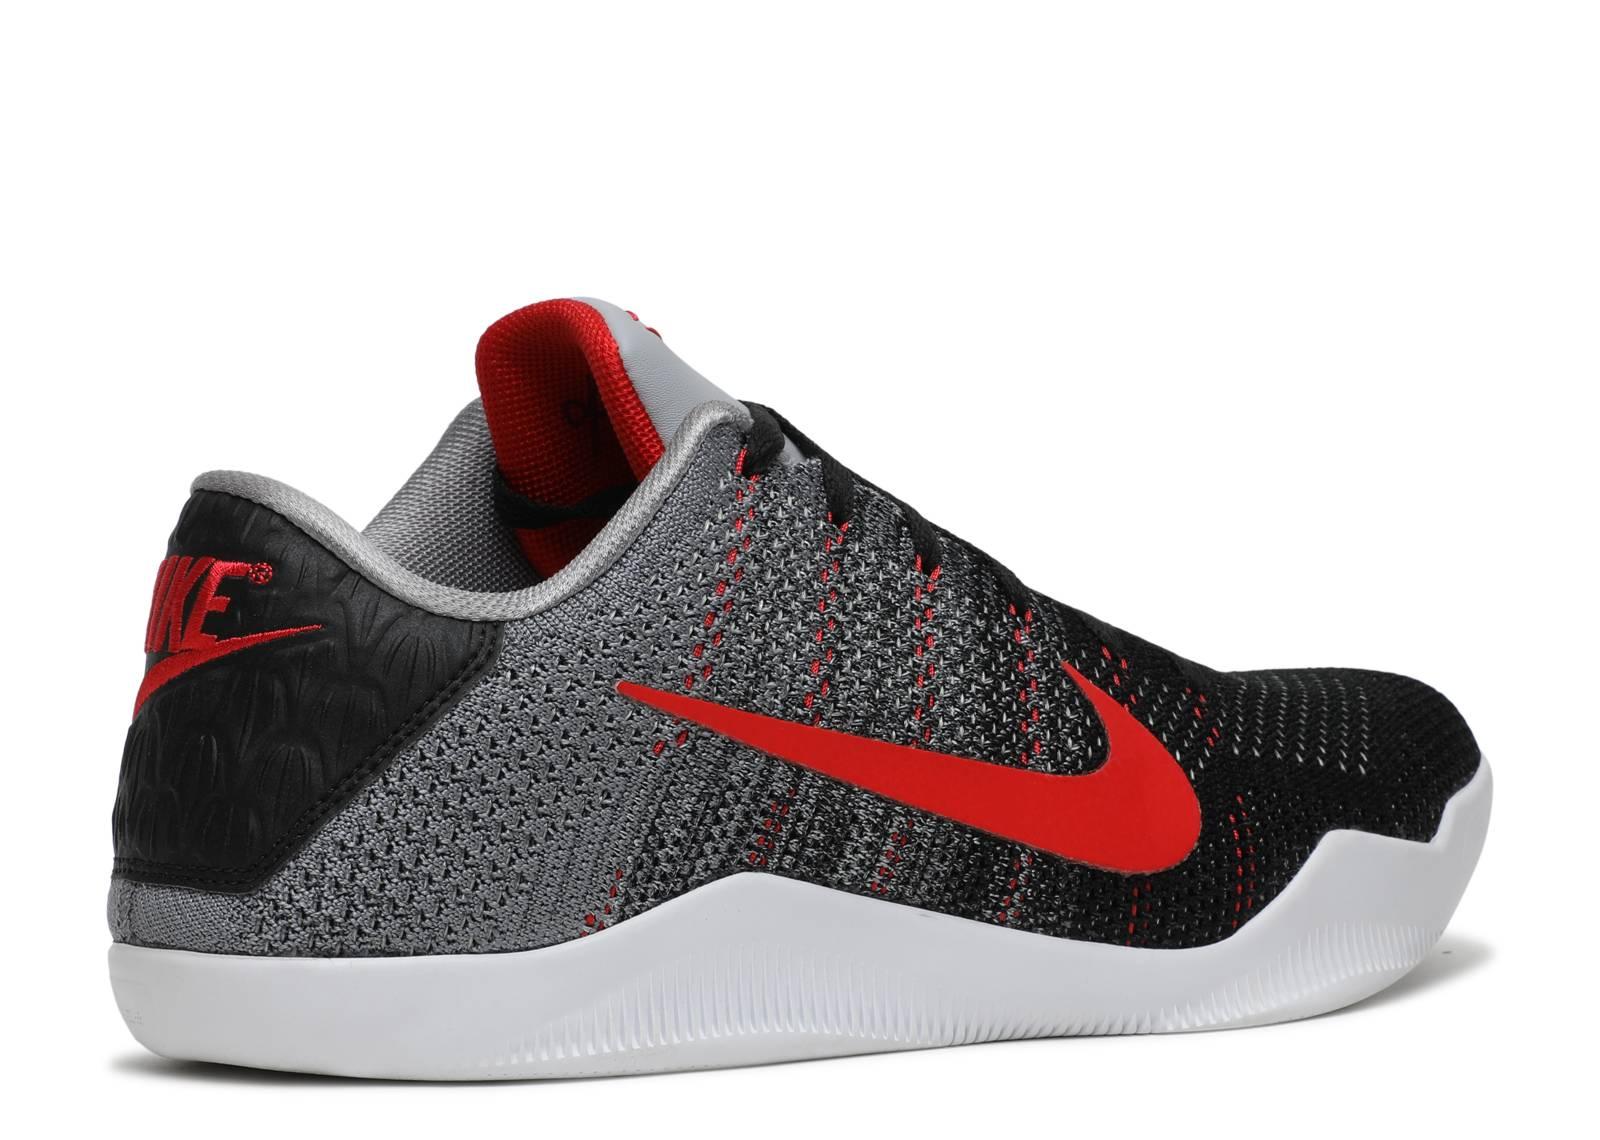 Nike Kobe 11 Elite Low \u201cTinker Hatfield\u201d Cool Grey/Black-University Red